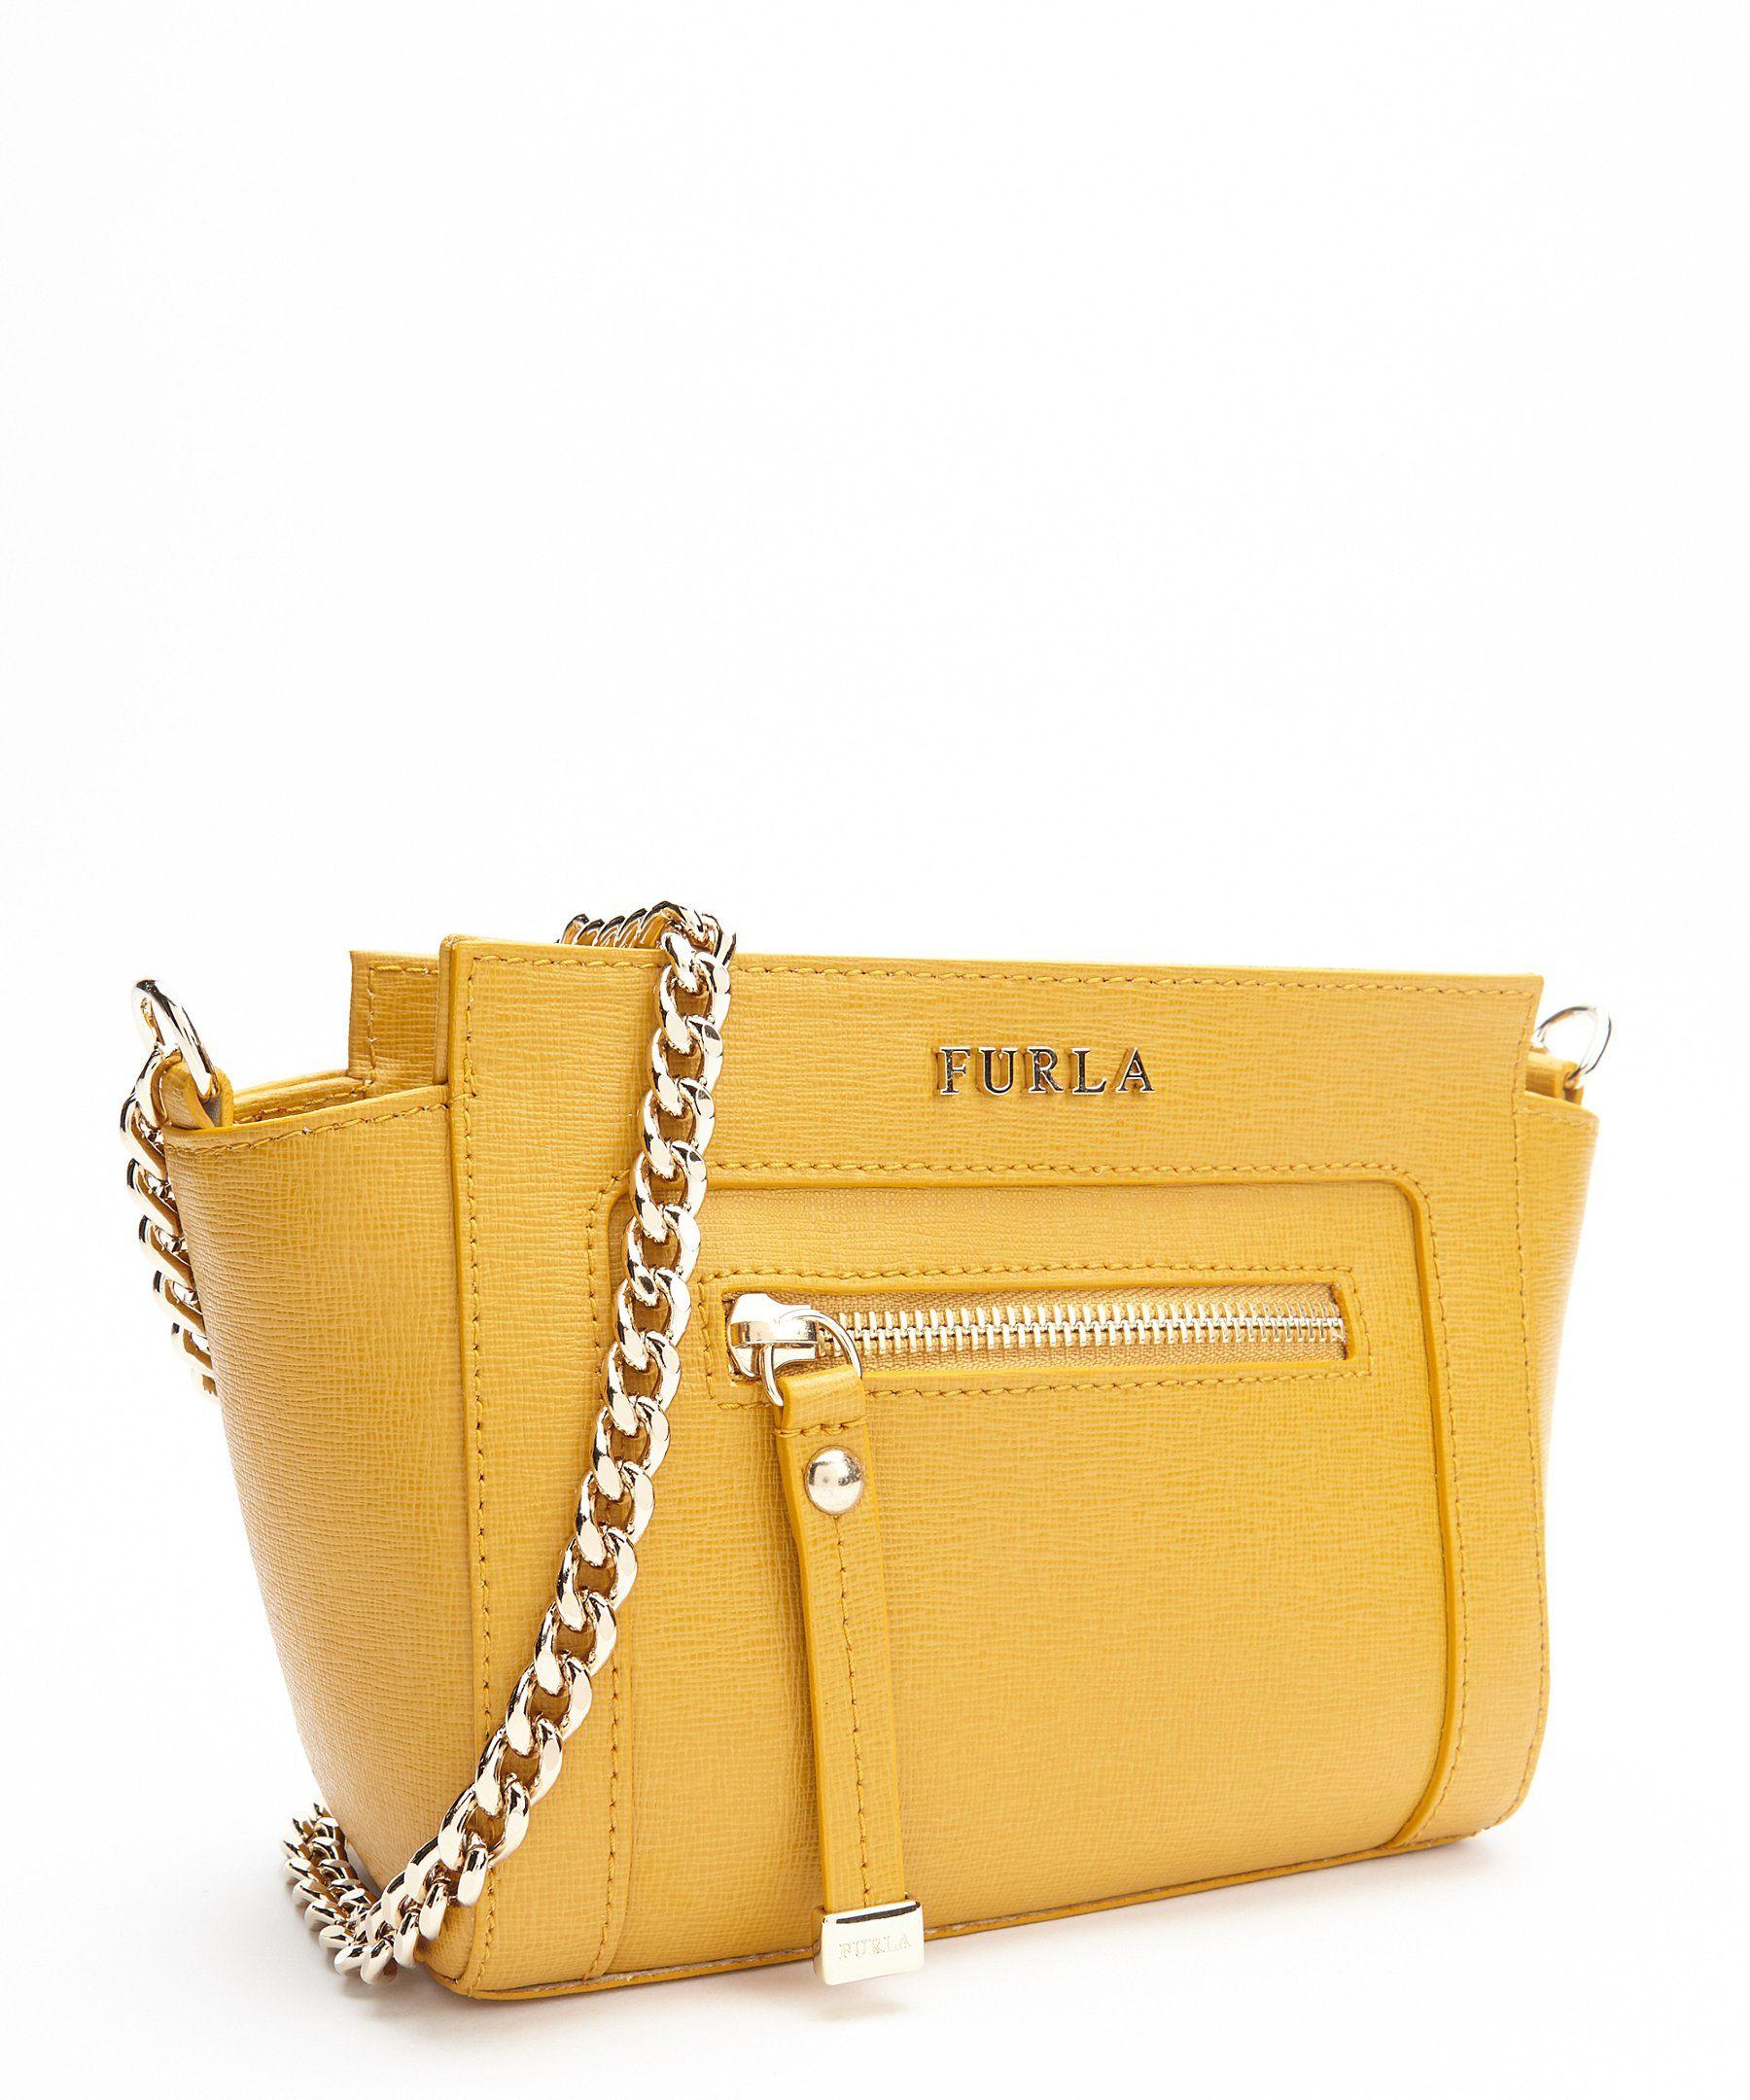 The Furla yellow leather mini 'Ginevra' chain crossbody at Bluefly.